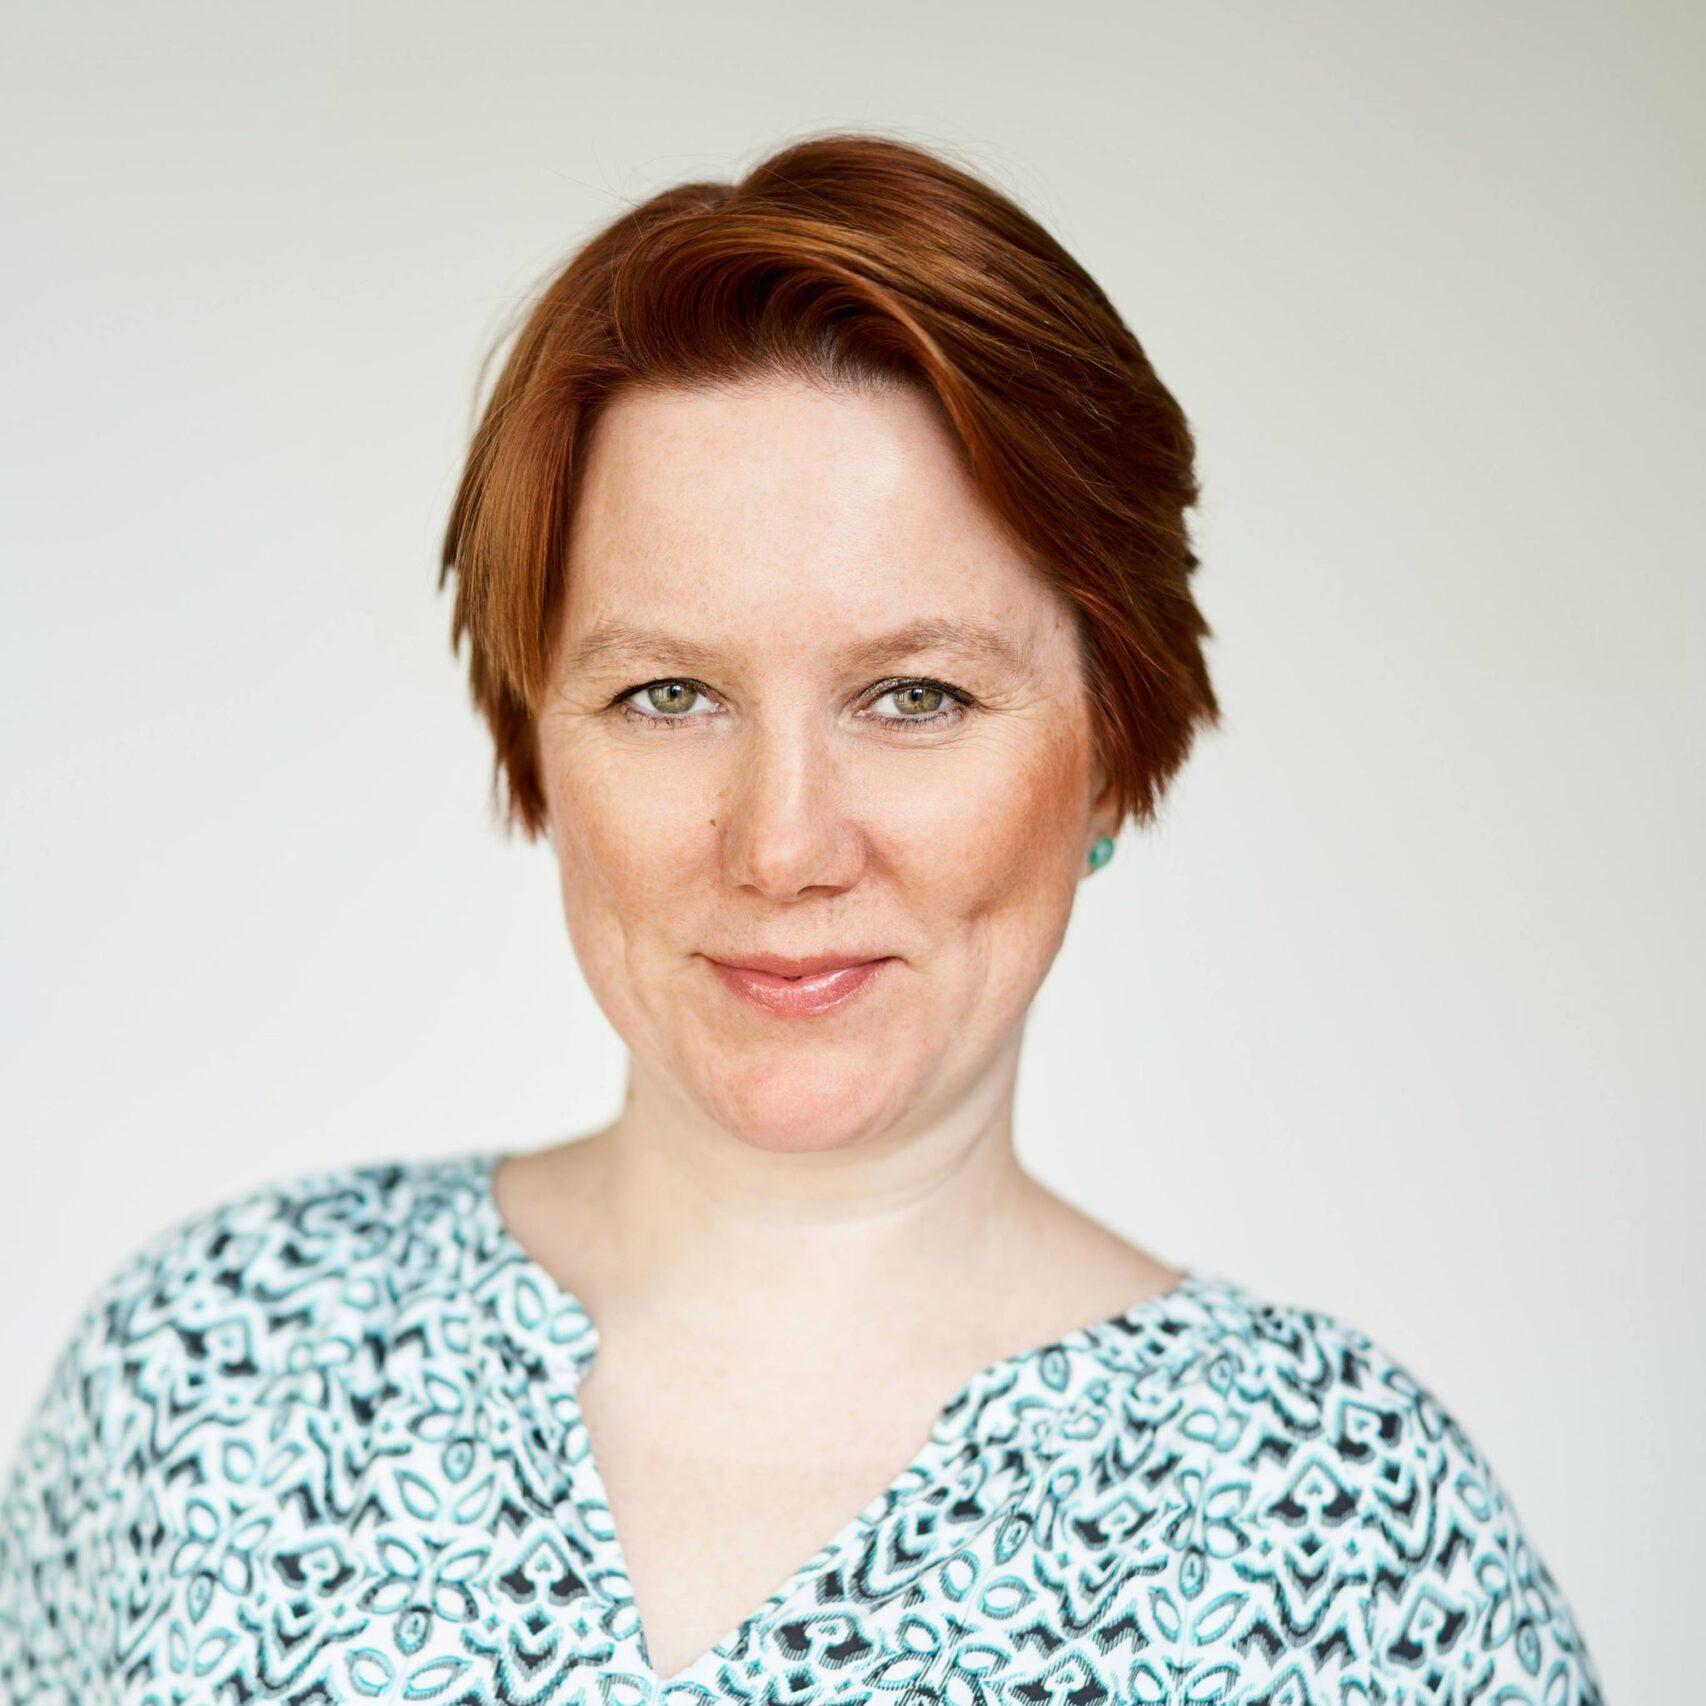 Karolina Kanar-Kossobudzka